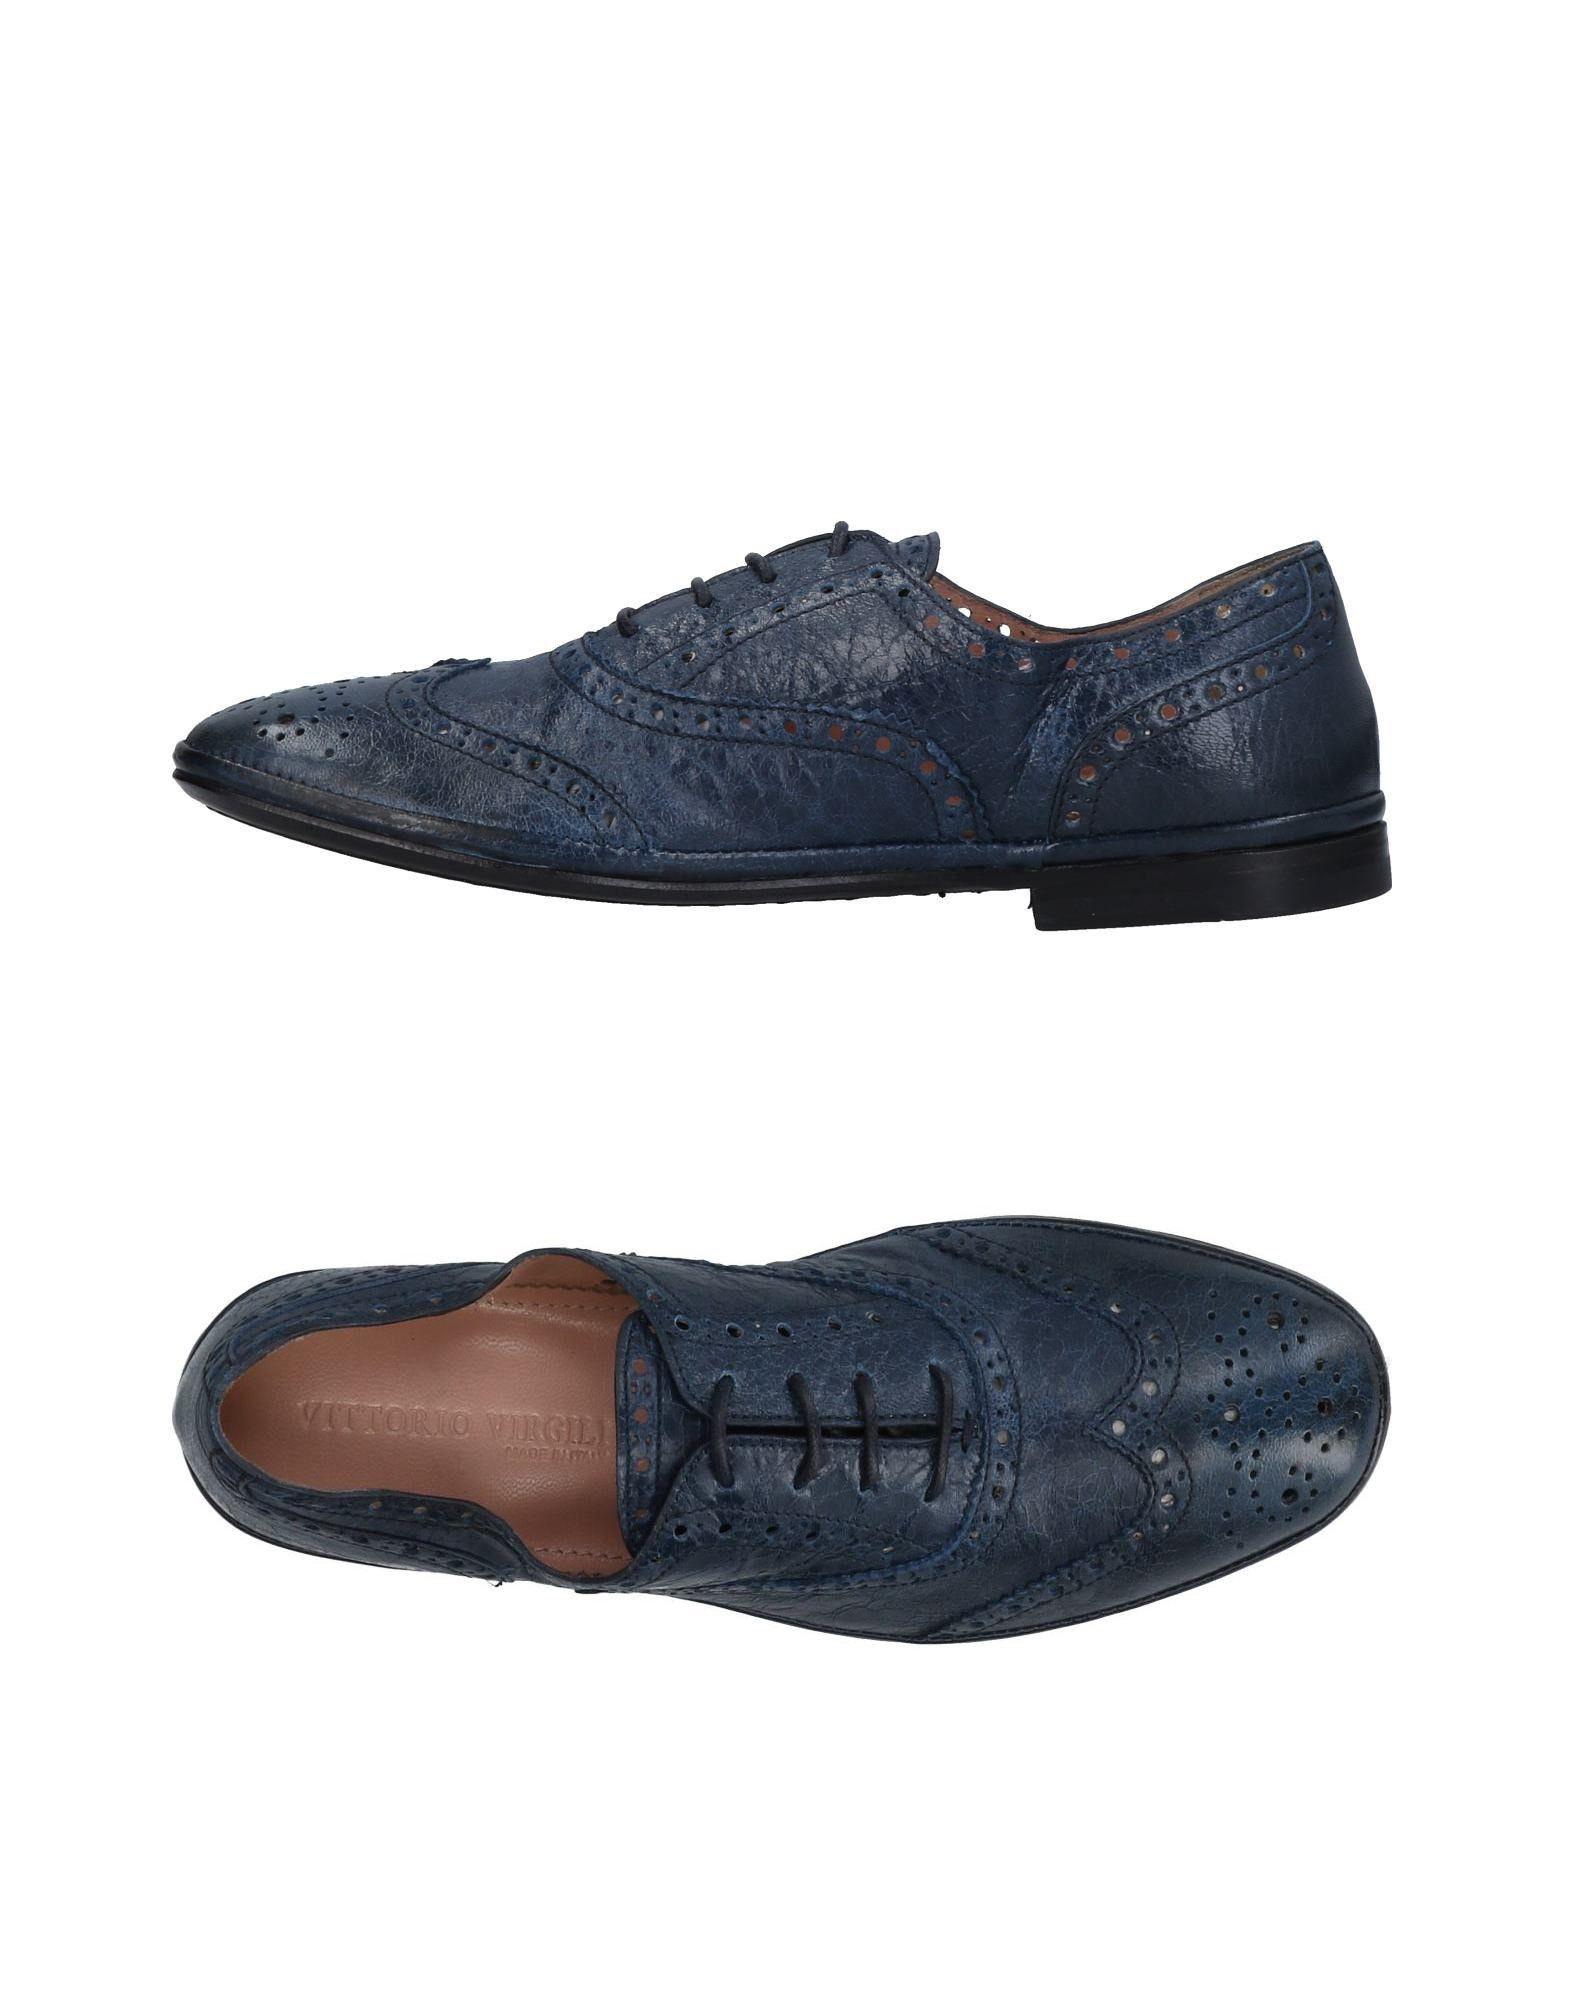 VITTORIO VIRGILI Обувь на шнурках vittorio virgili сапоги